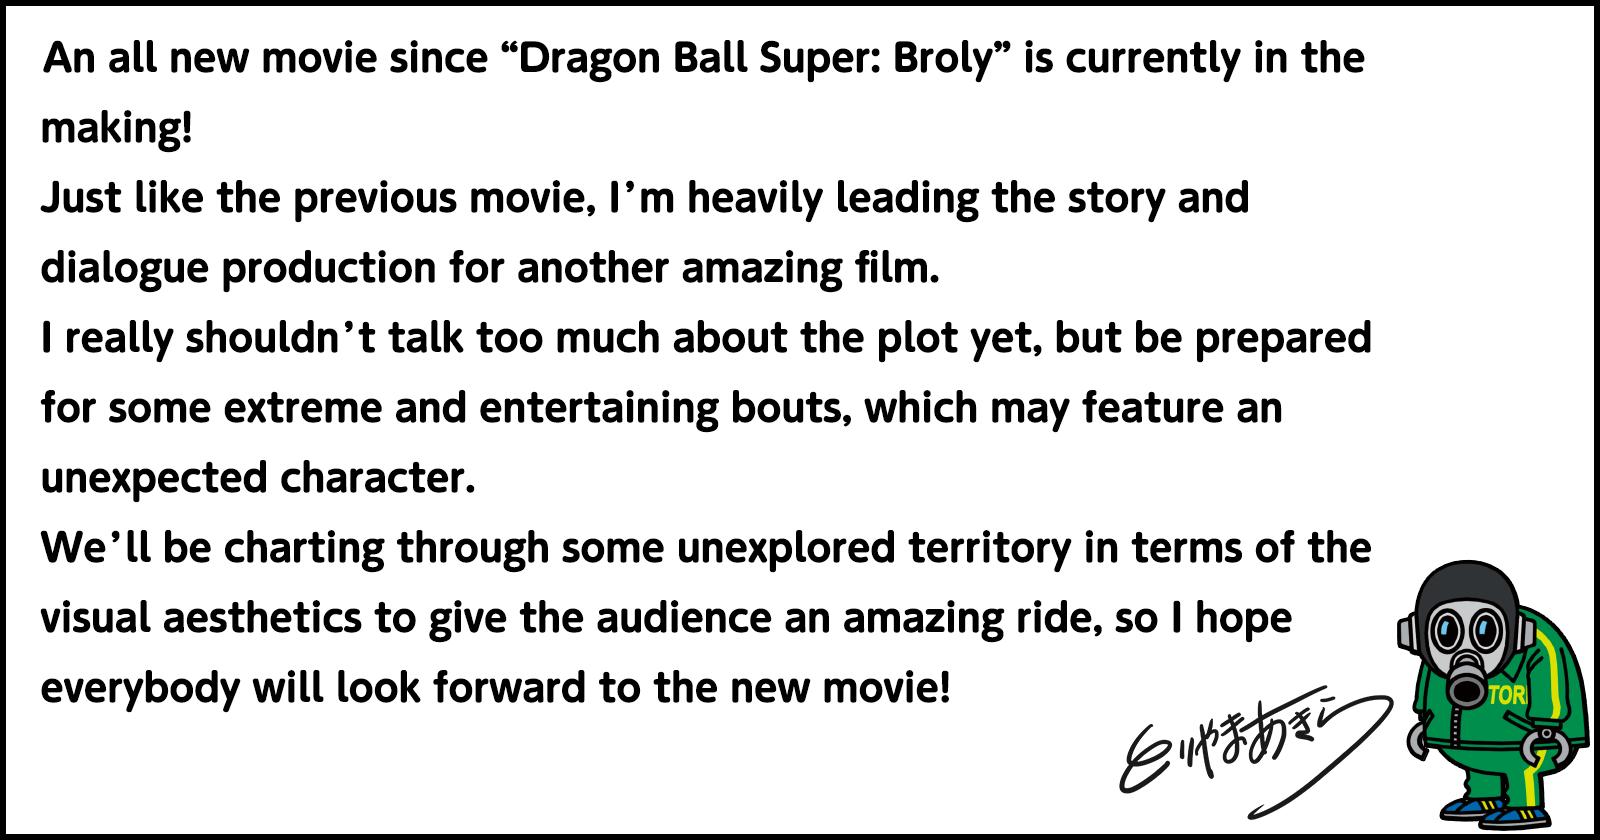 dragon ball super película 2022 akira toriyama